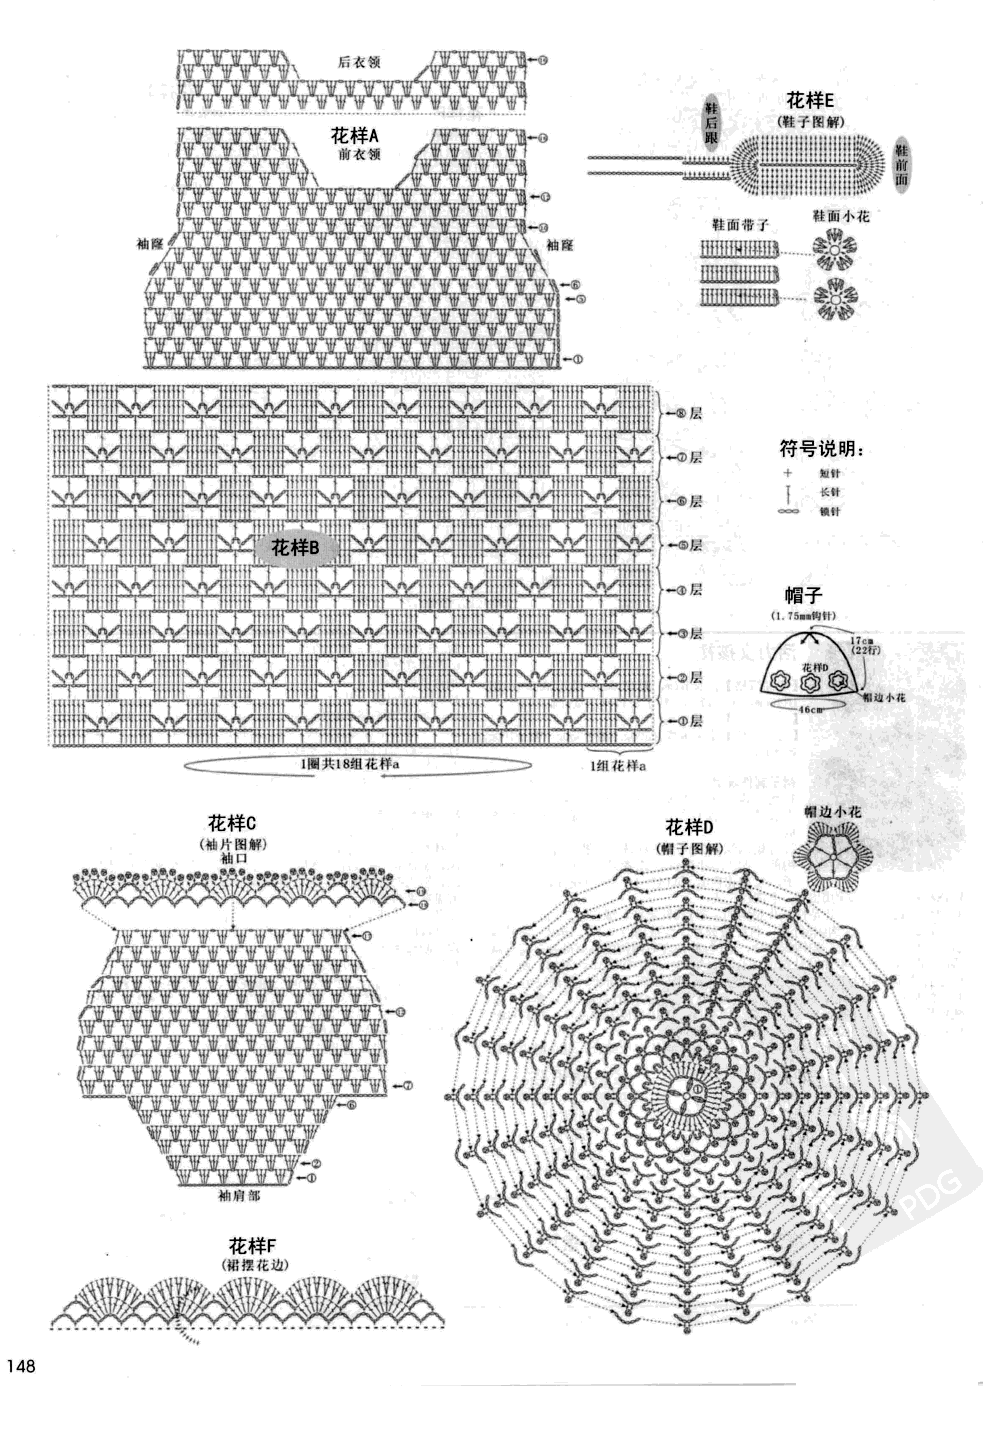 p (148).jpg